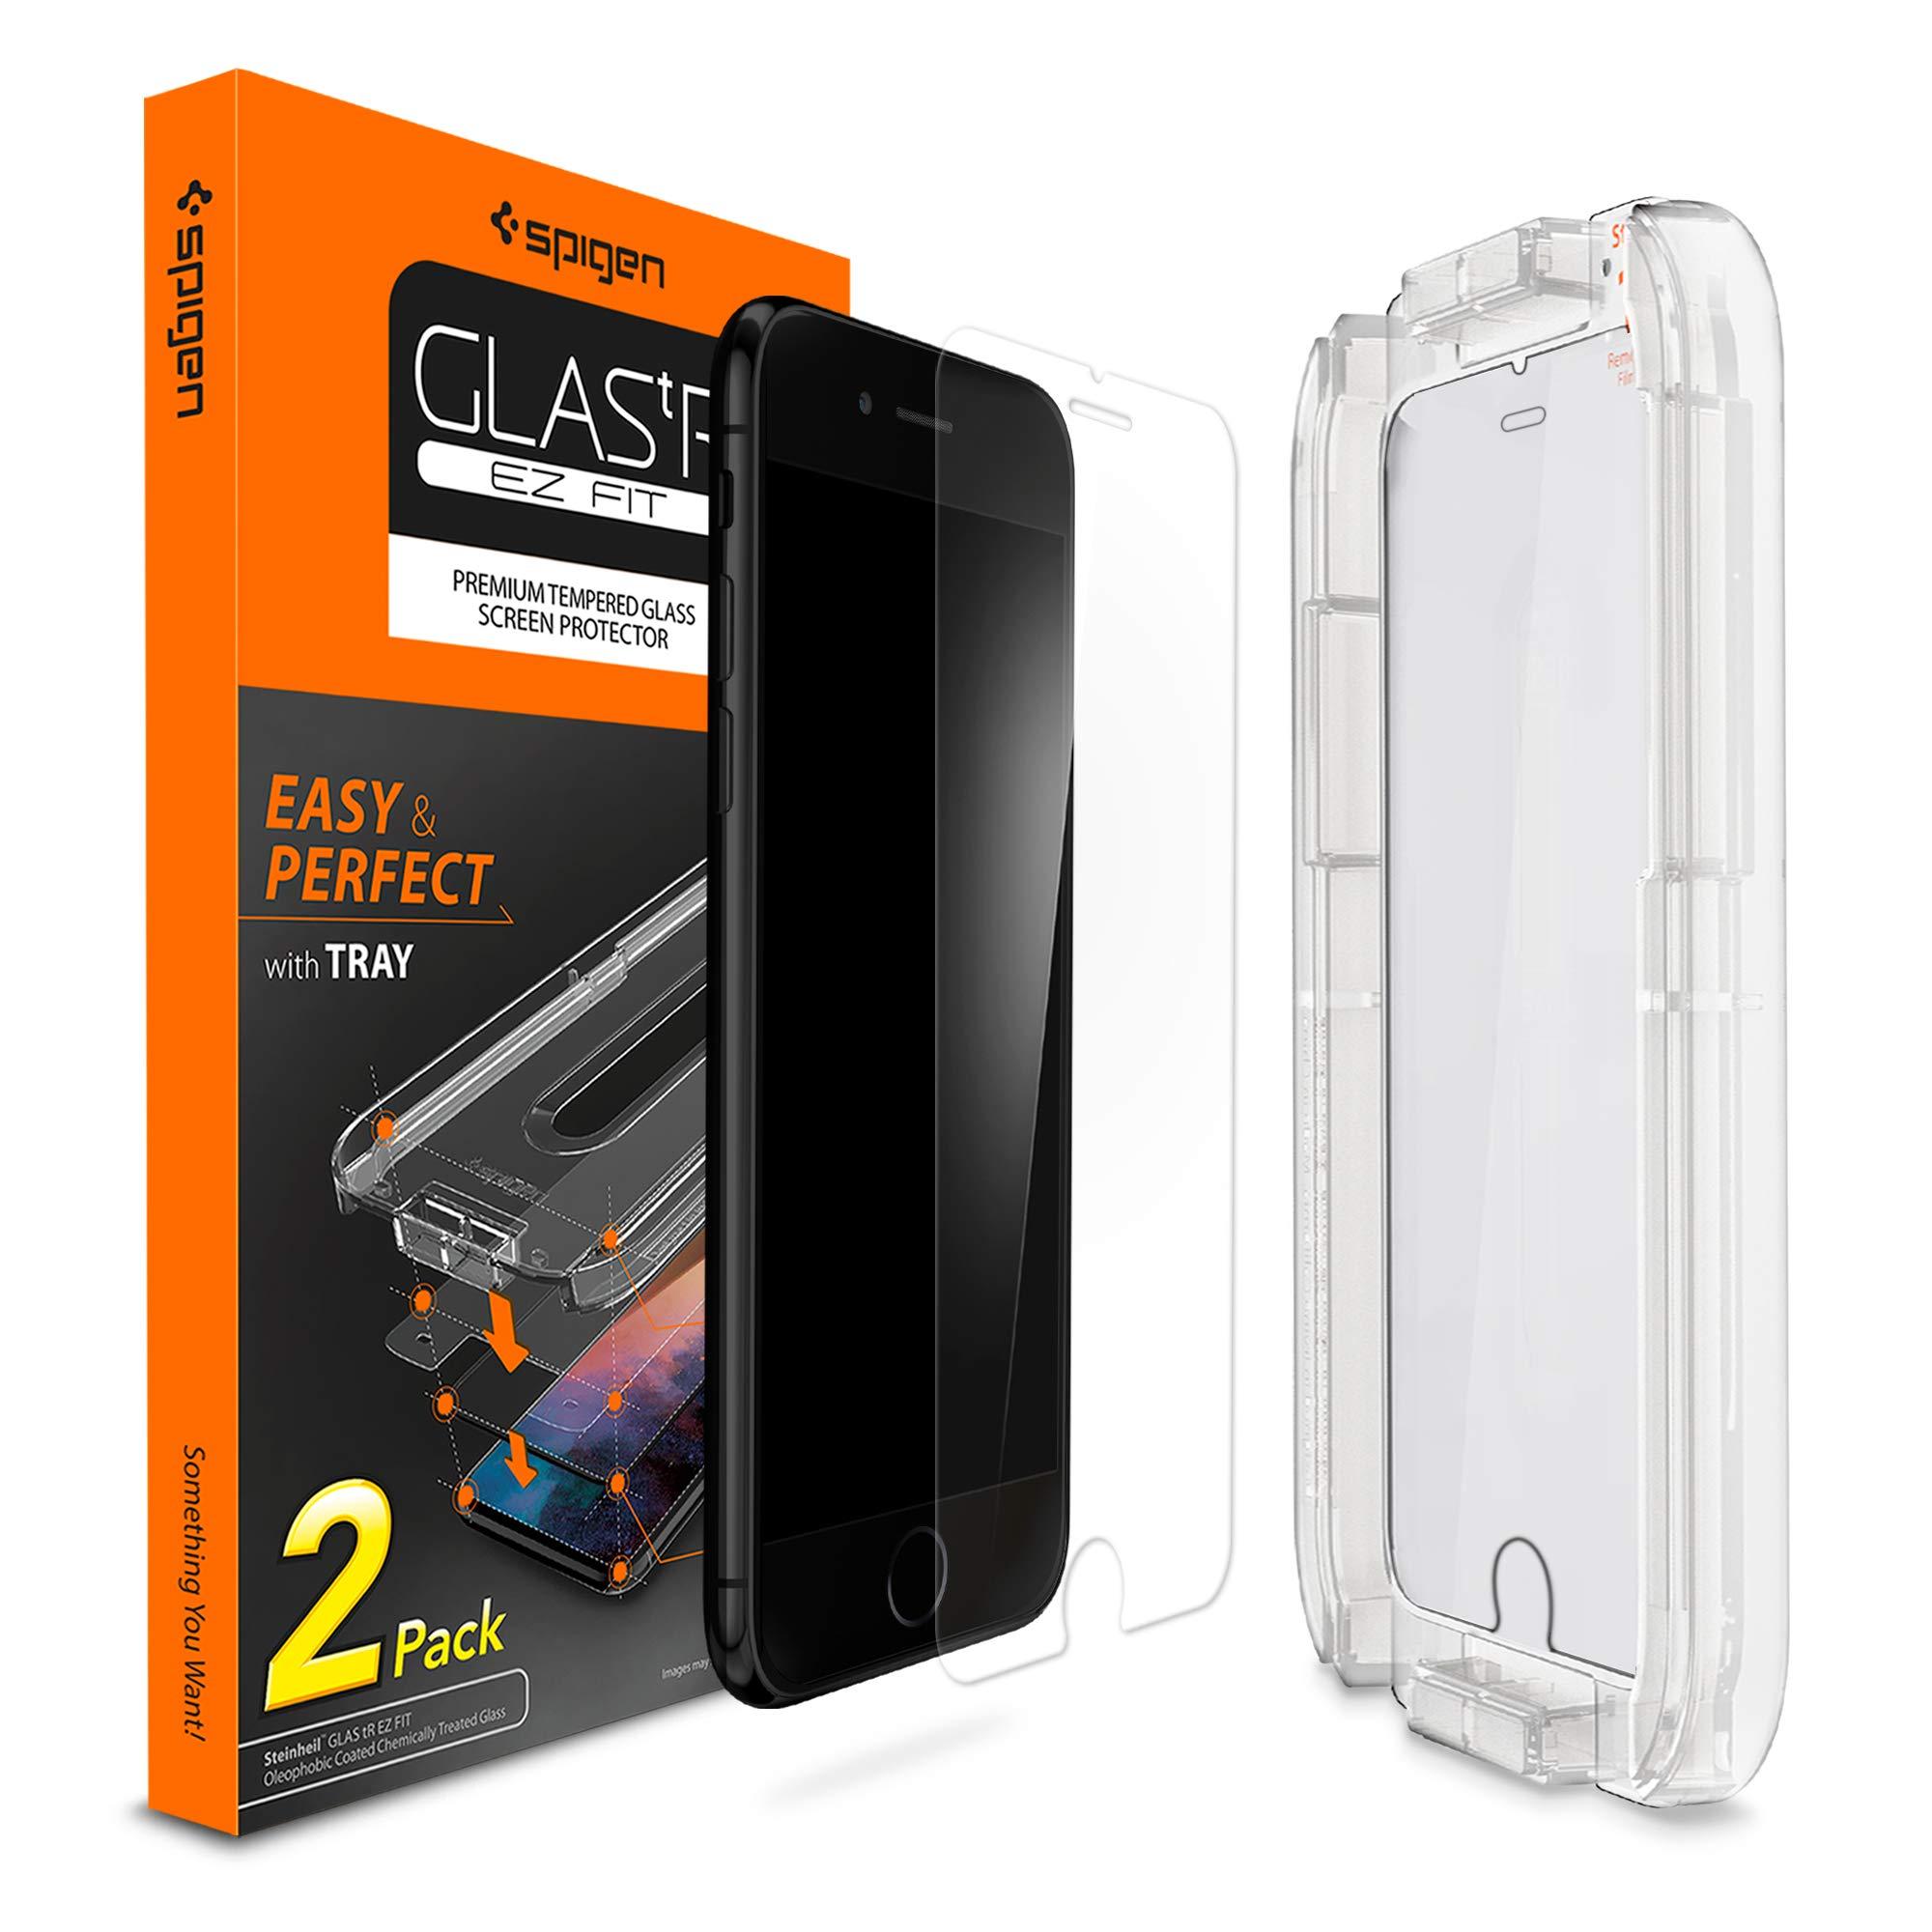 Vidrio Templado Spigen P/ iPhone 8 Plus Pack X 2